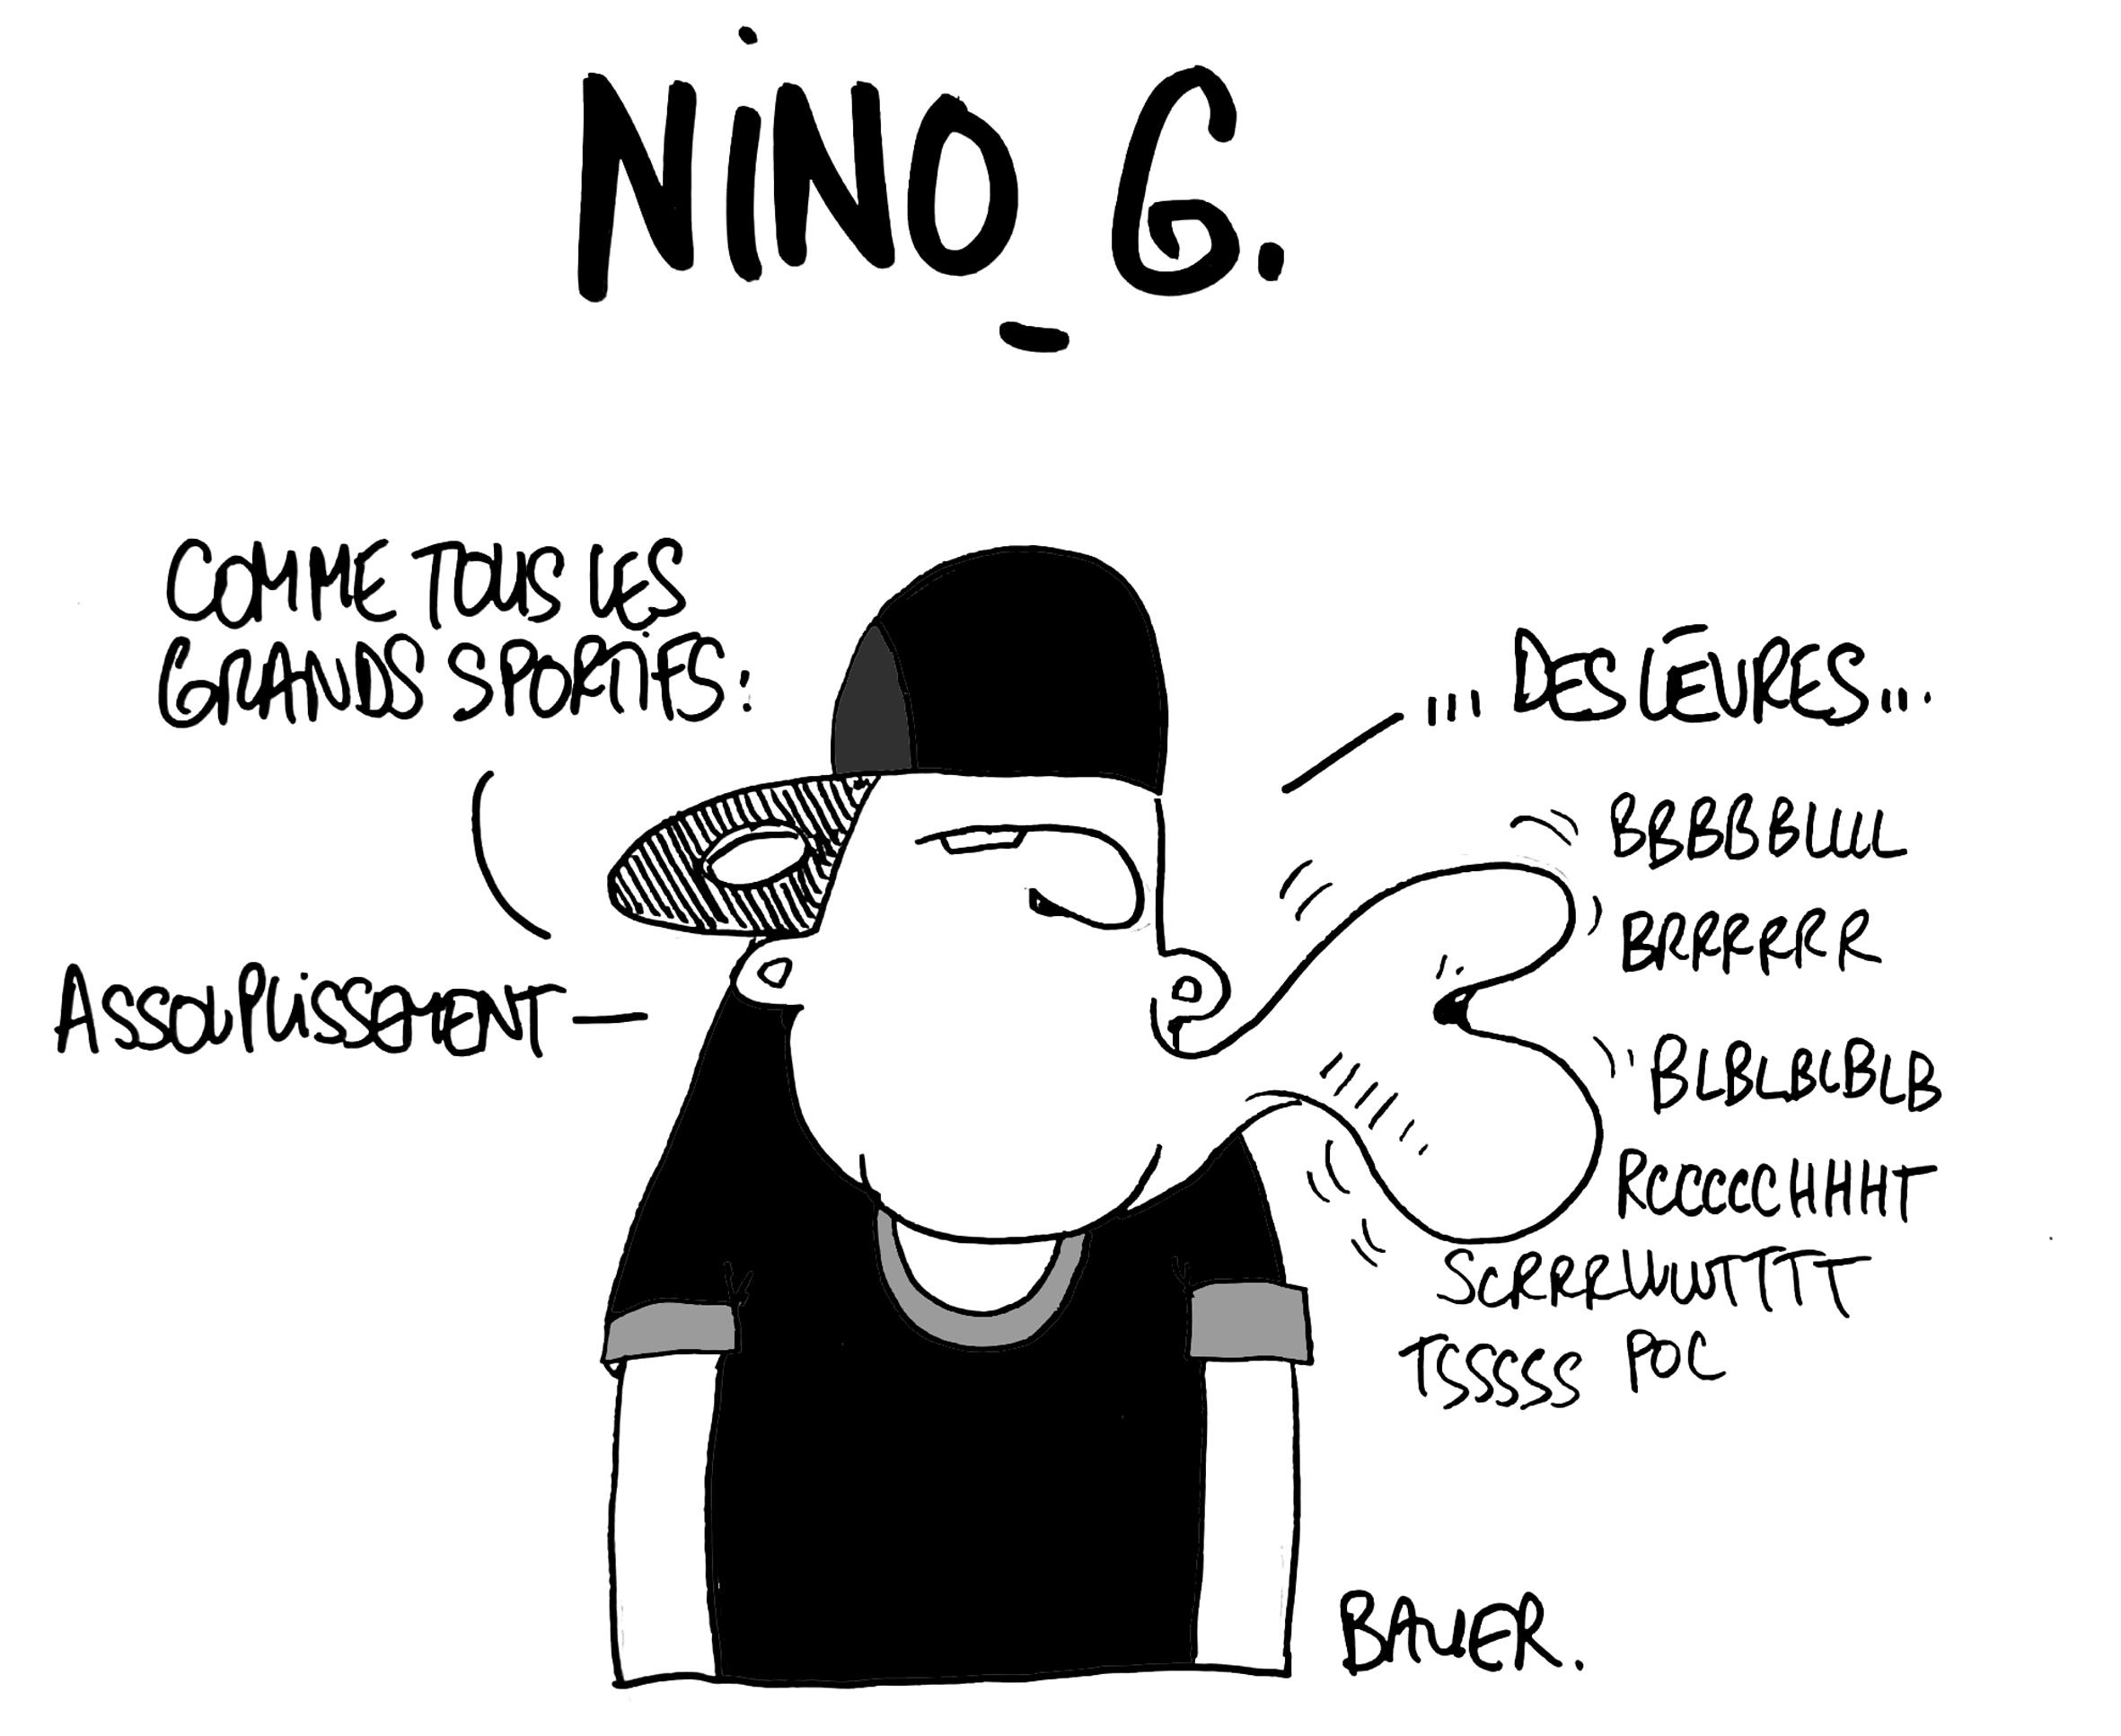 Nino G sportif de la bouche ©Bauer ©Absolument